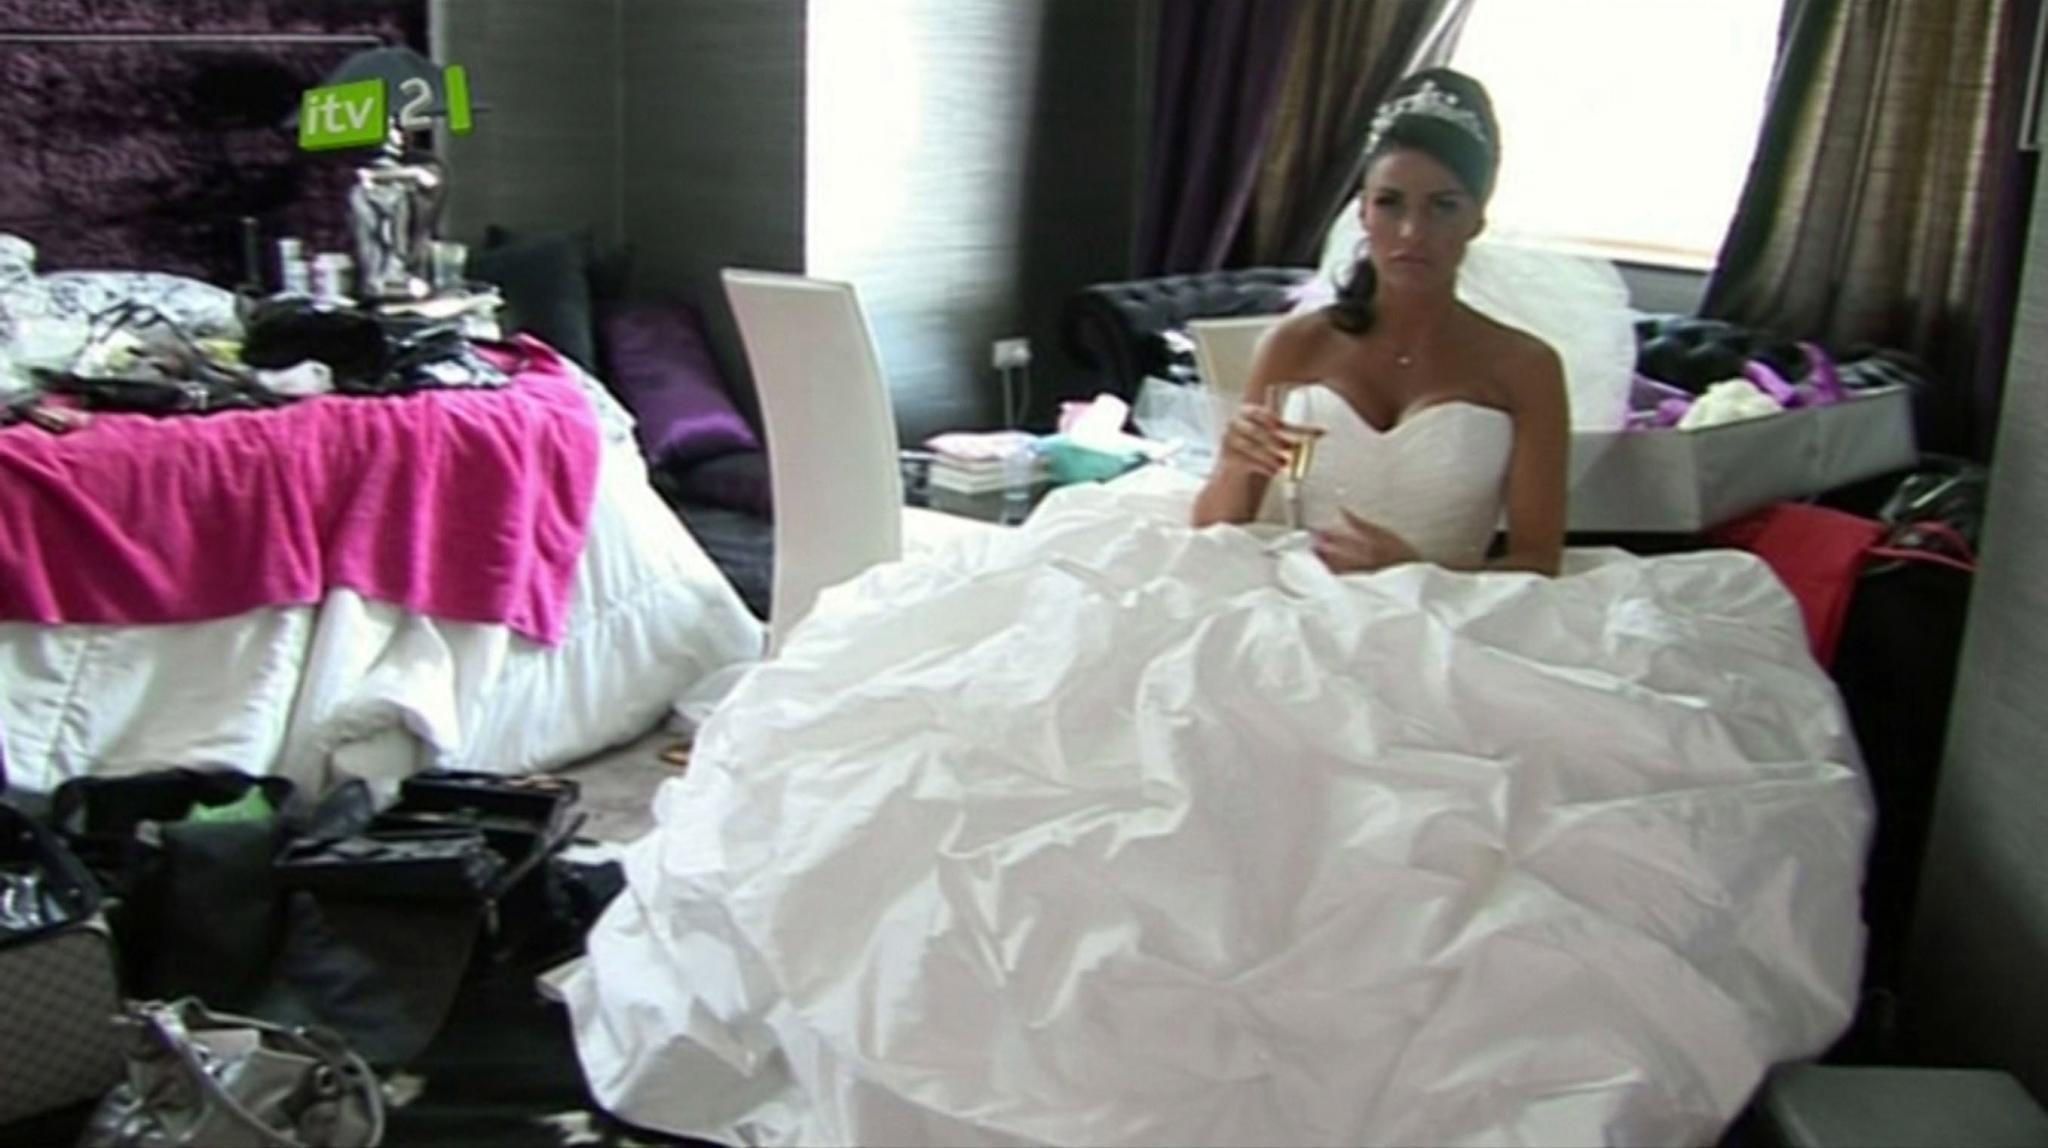 Daniela katzenberger brautkleid wo gekauft